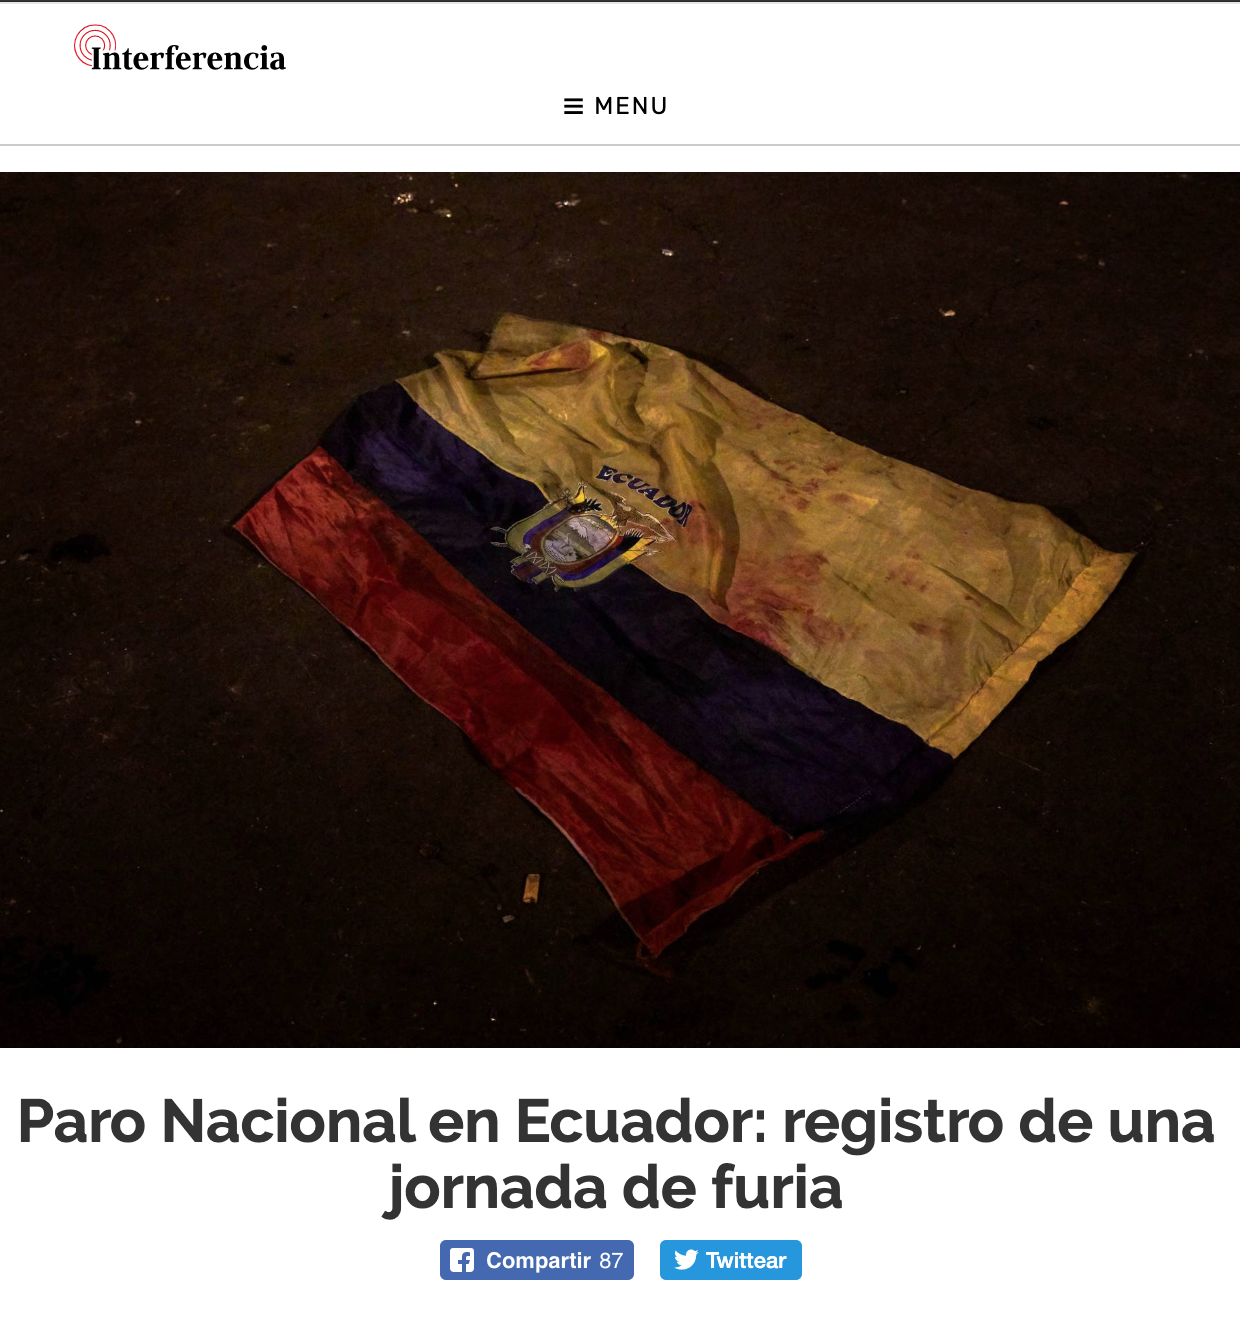 INTERFERENCIA CL - 2019 - Publication - web